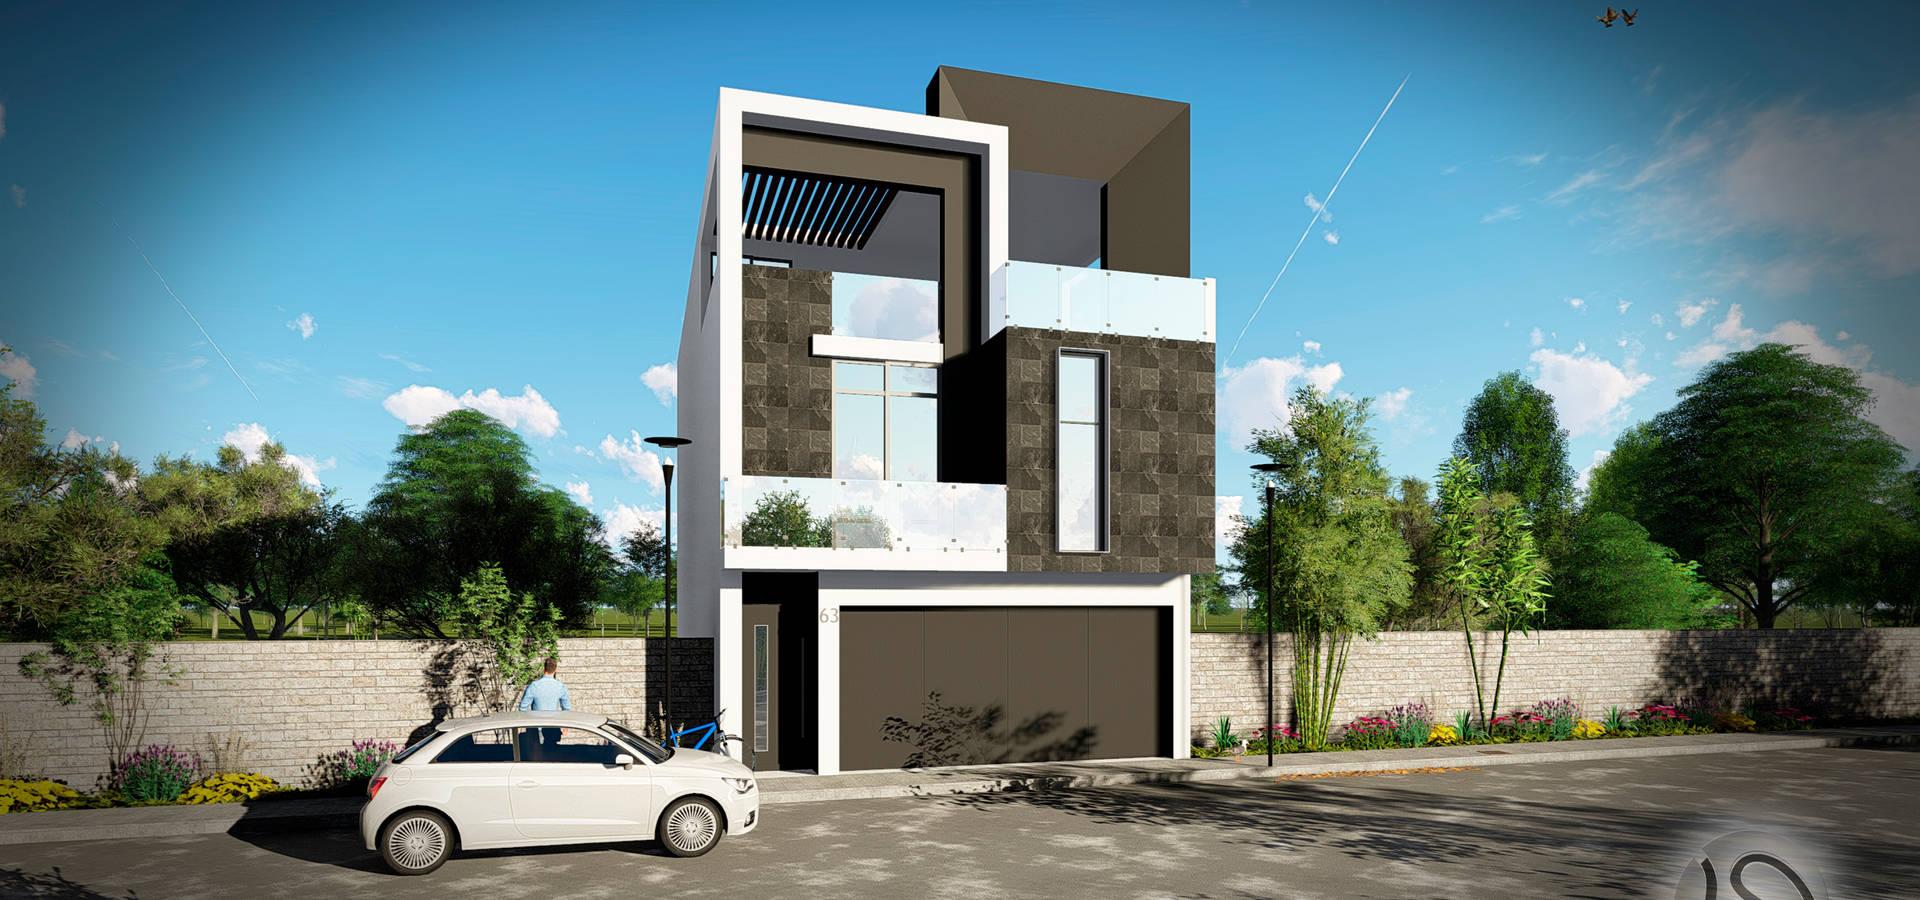 Salazar Arquitectos